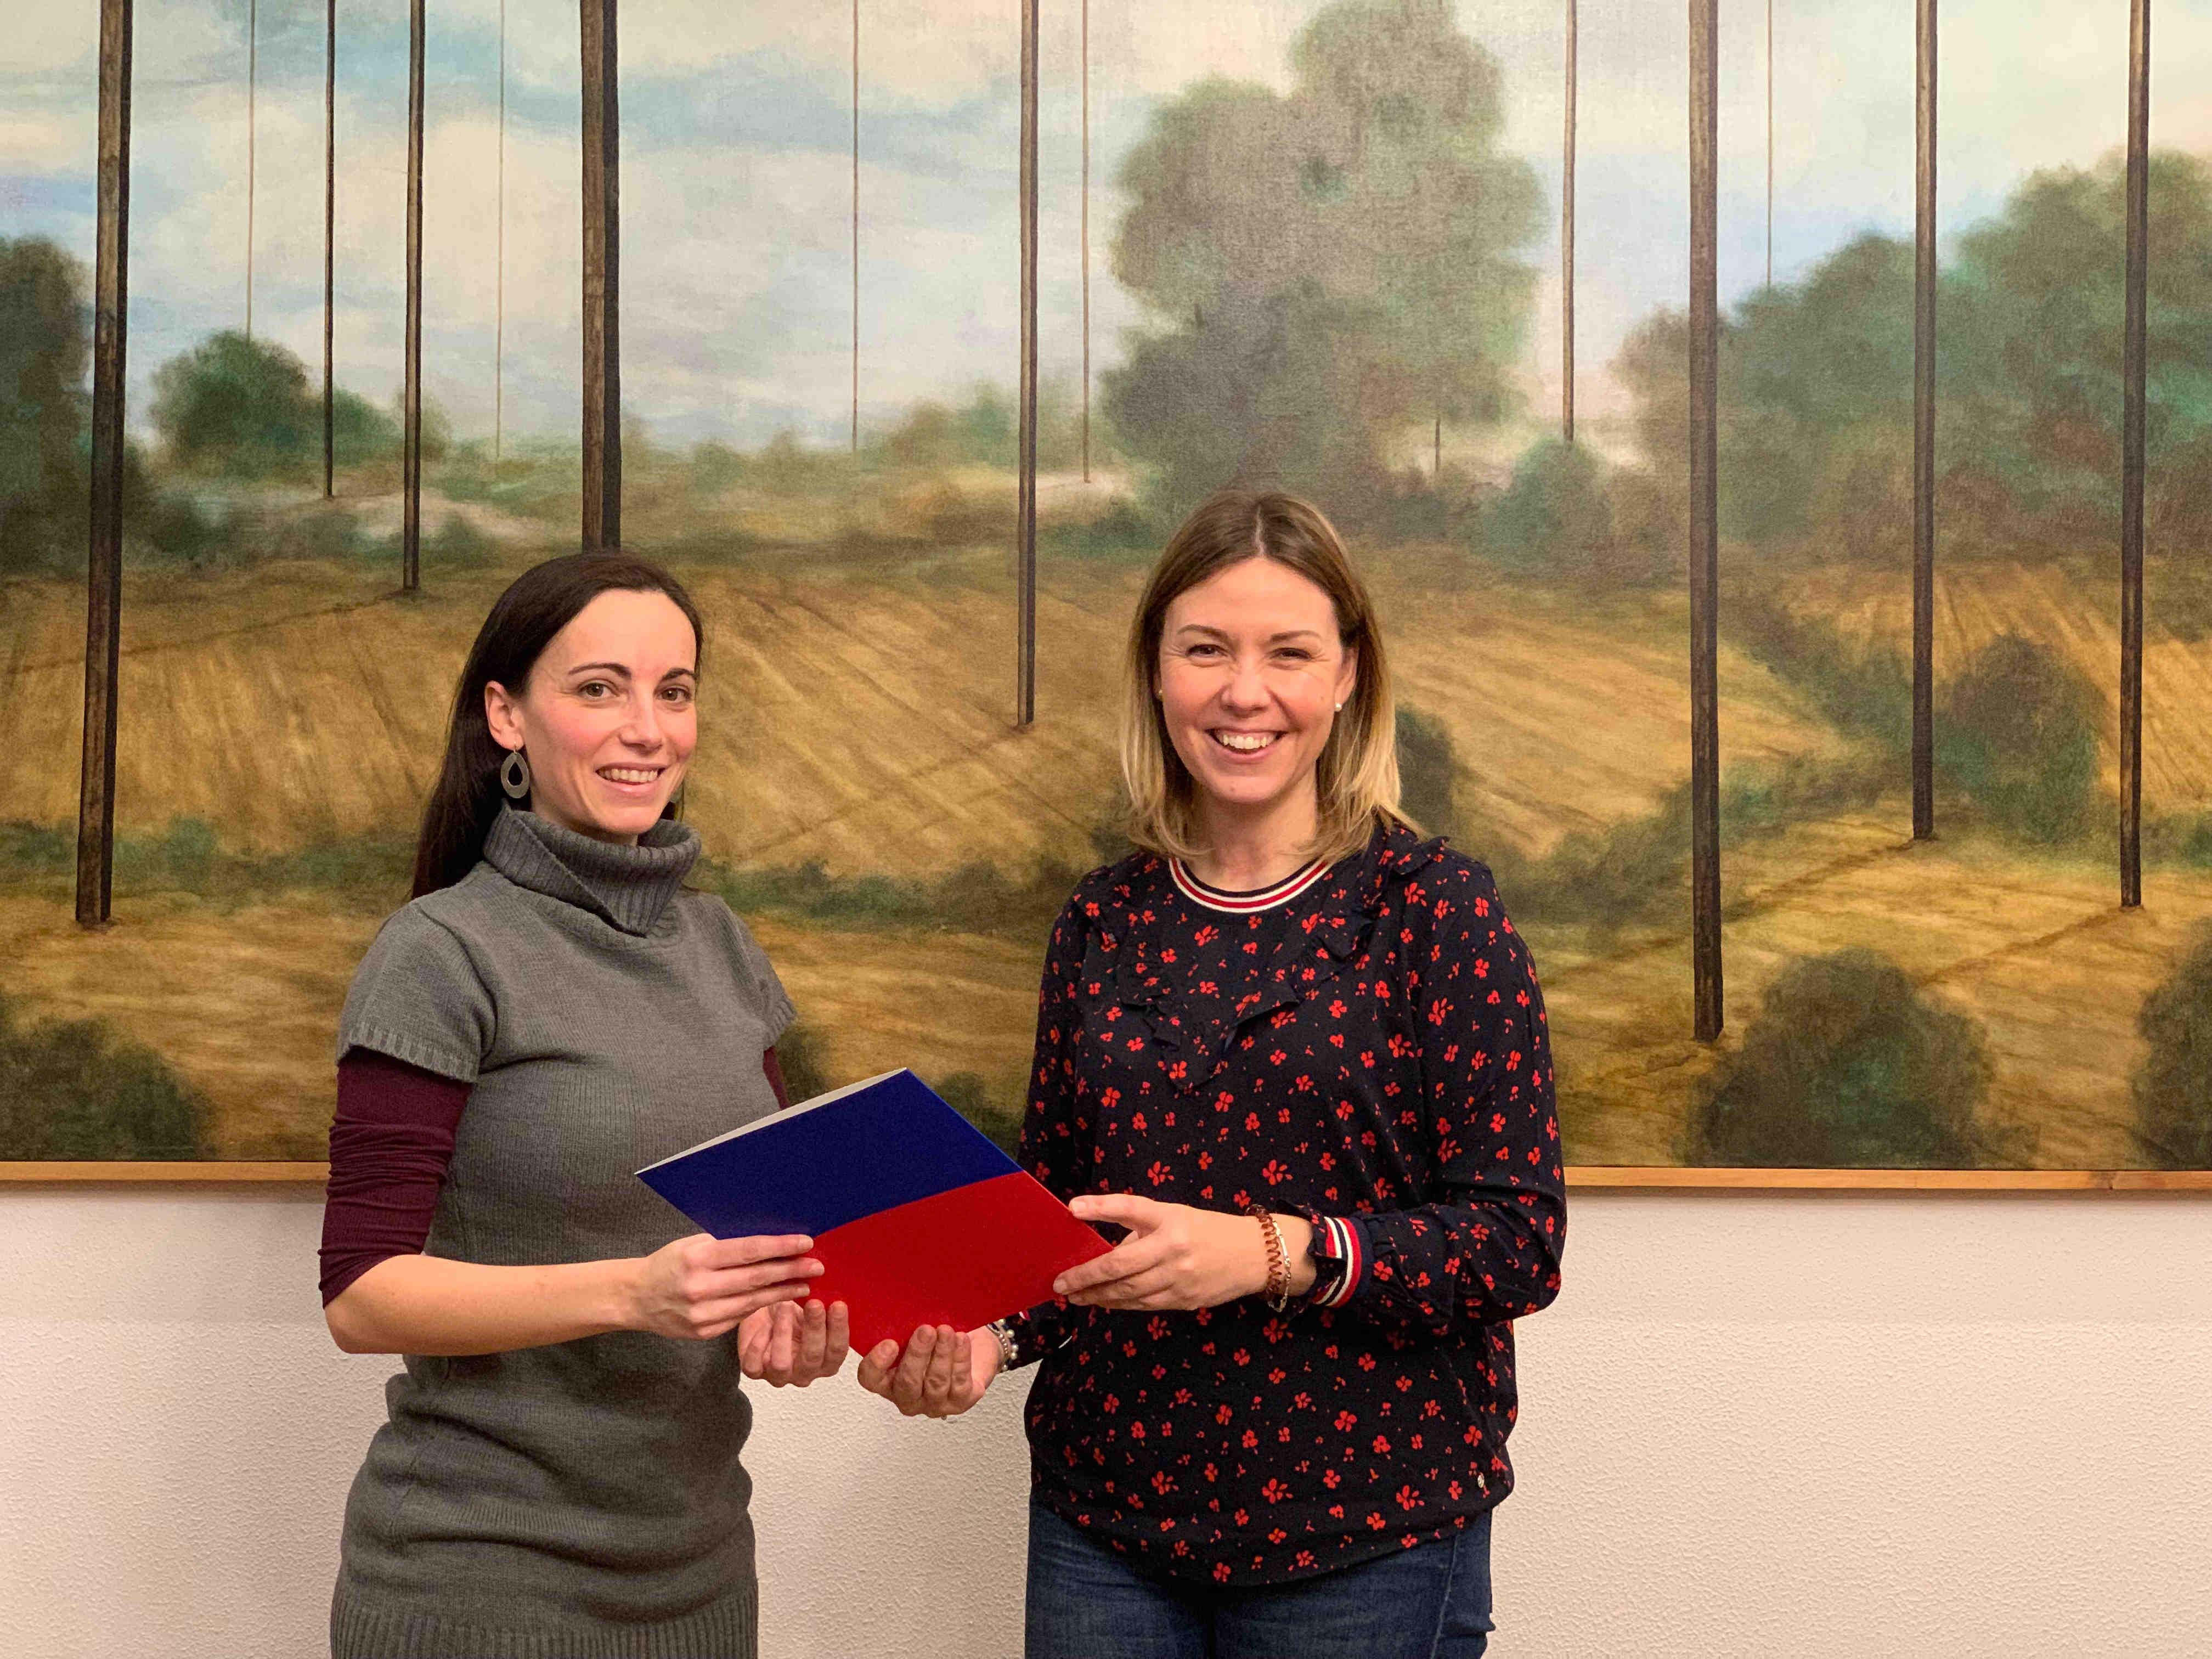 Convenio de colaboración co Conservatorio de Danza